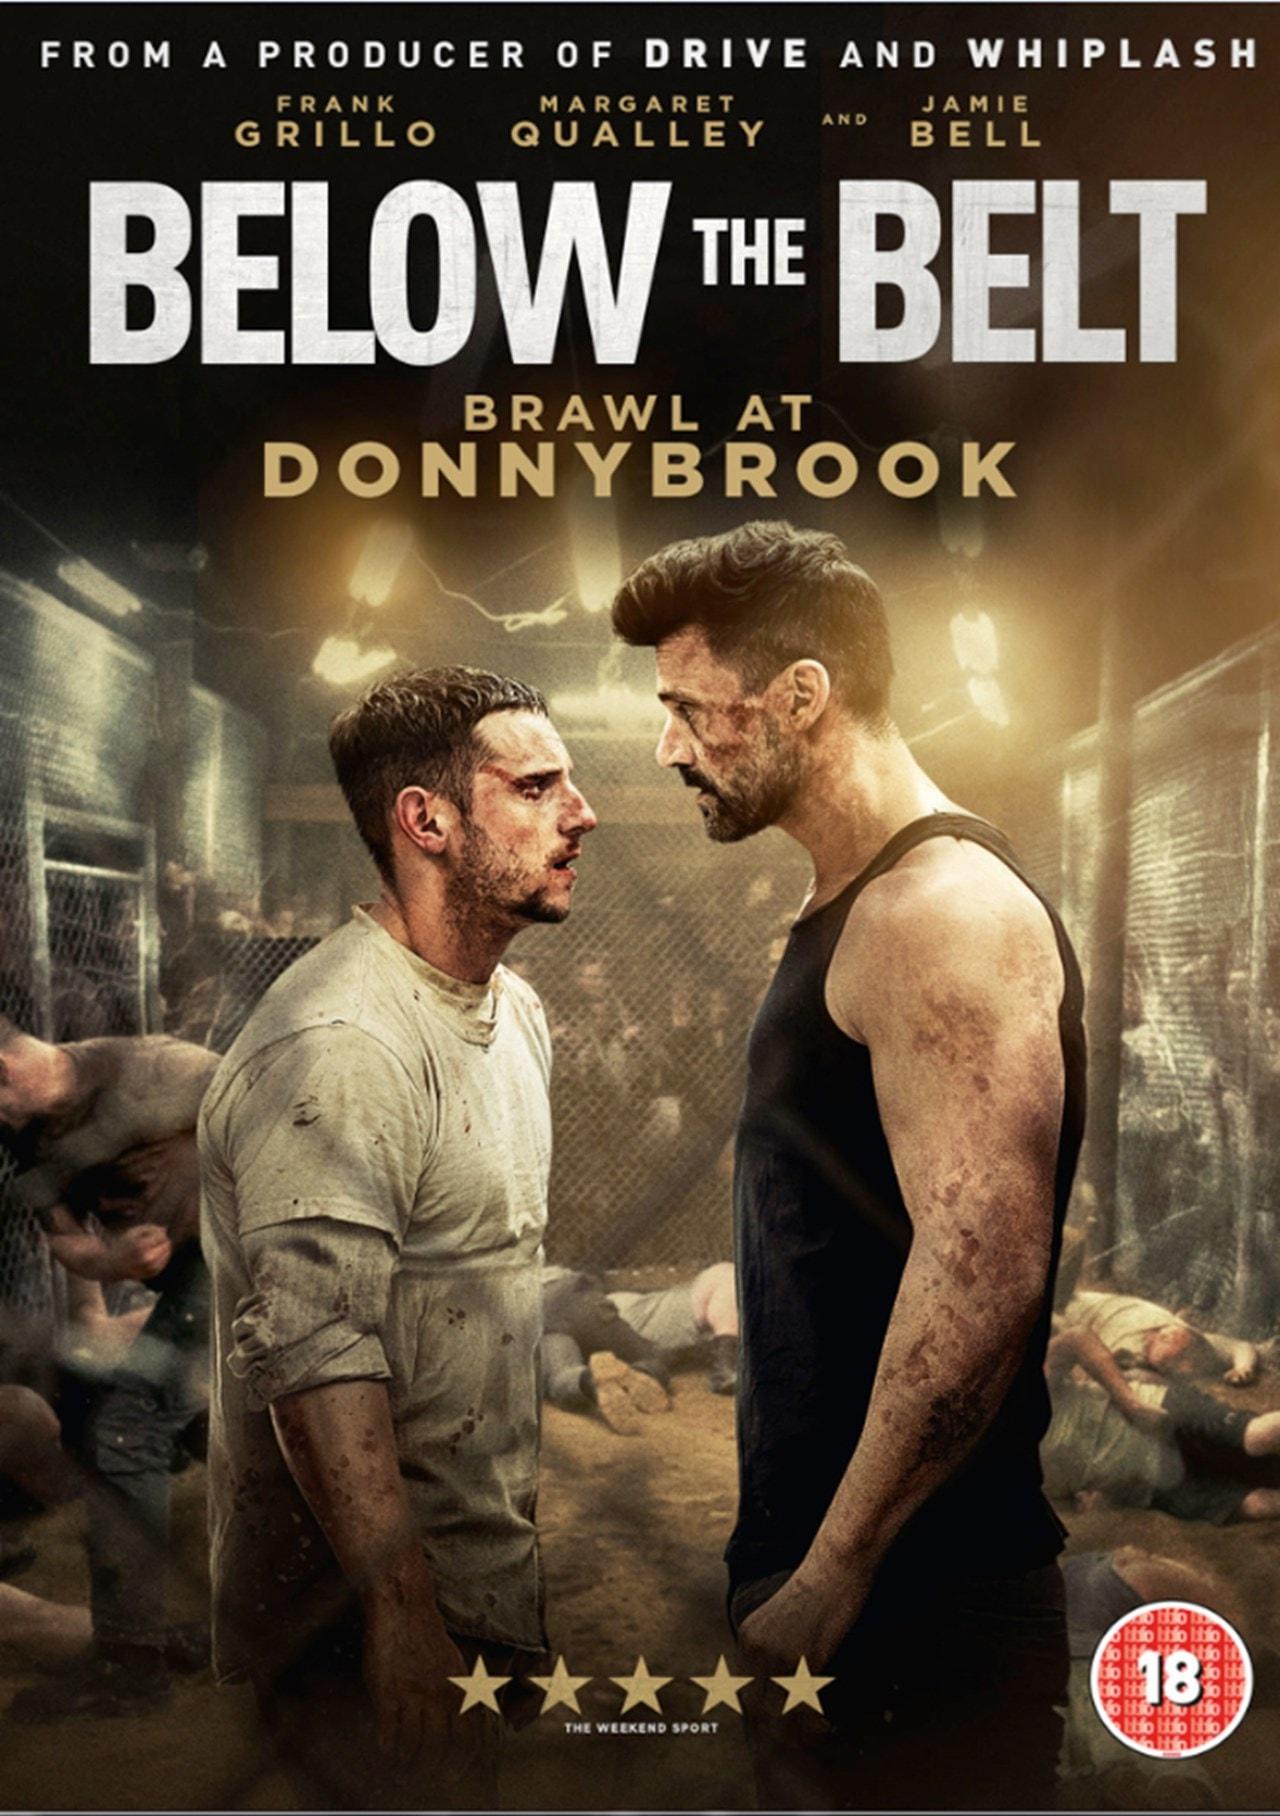 Below the Belt: Brawl at Donnybrook - 1